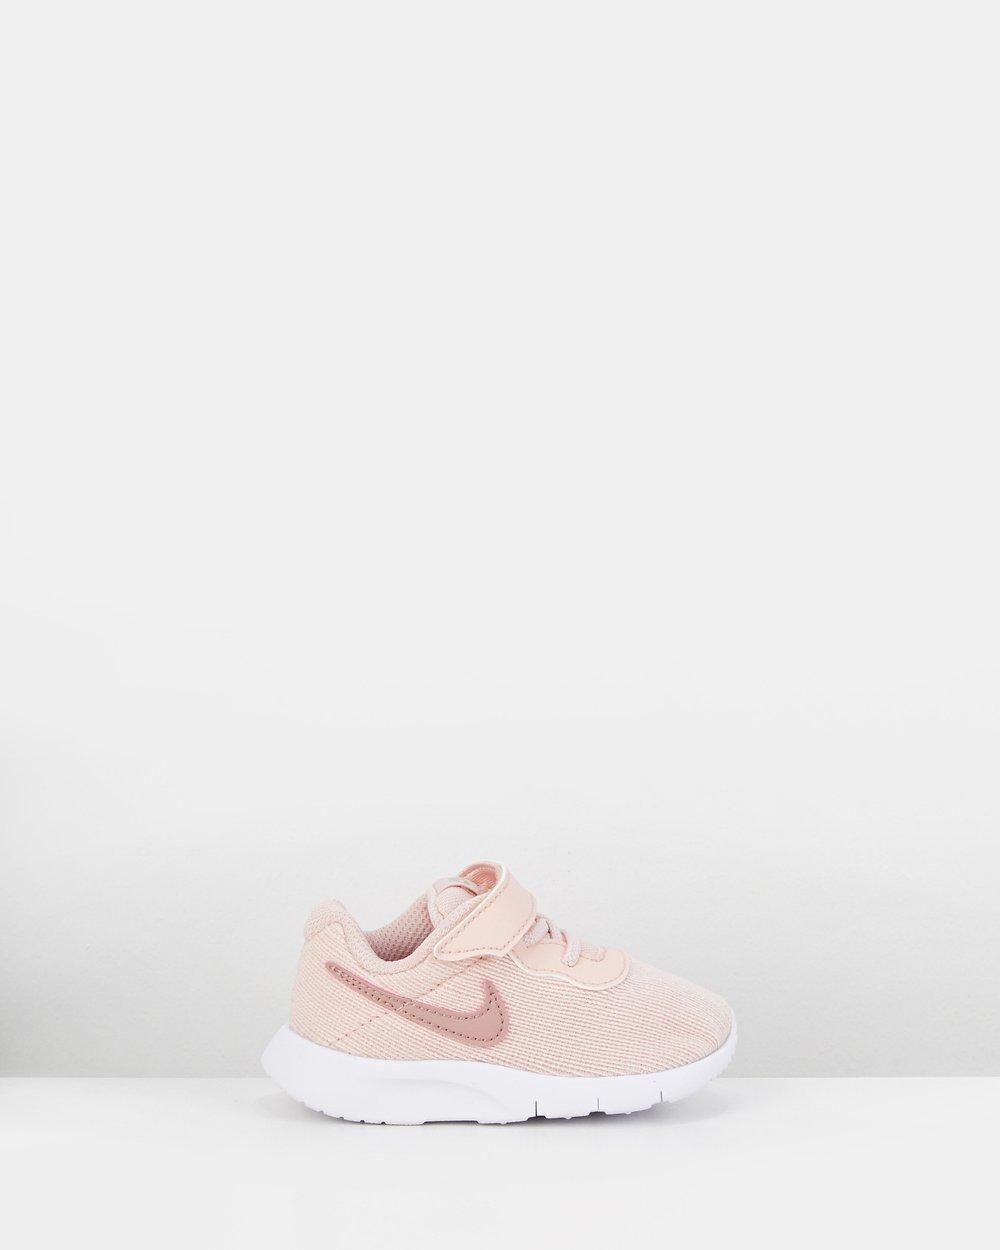 13812188b6 Tanjun SE TDV Girls Toddler Shoes by Nike Online   THE ICONIC   Australia